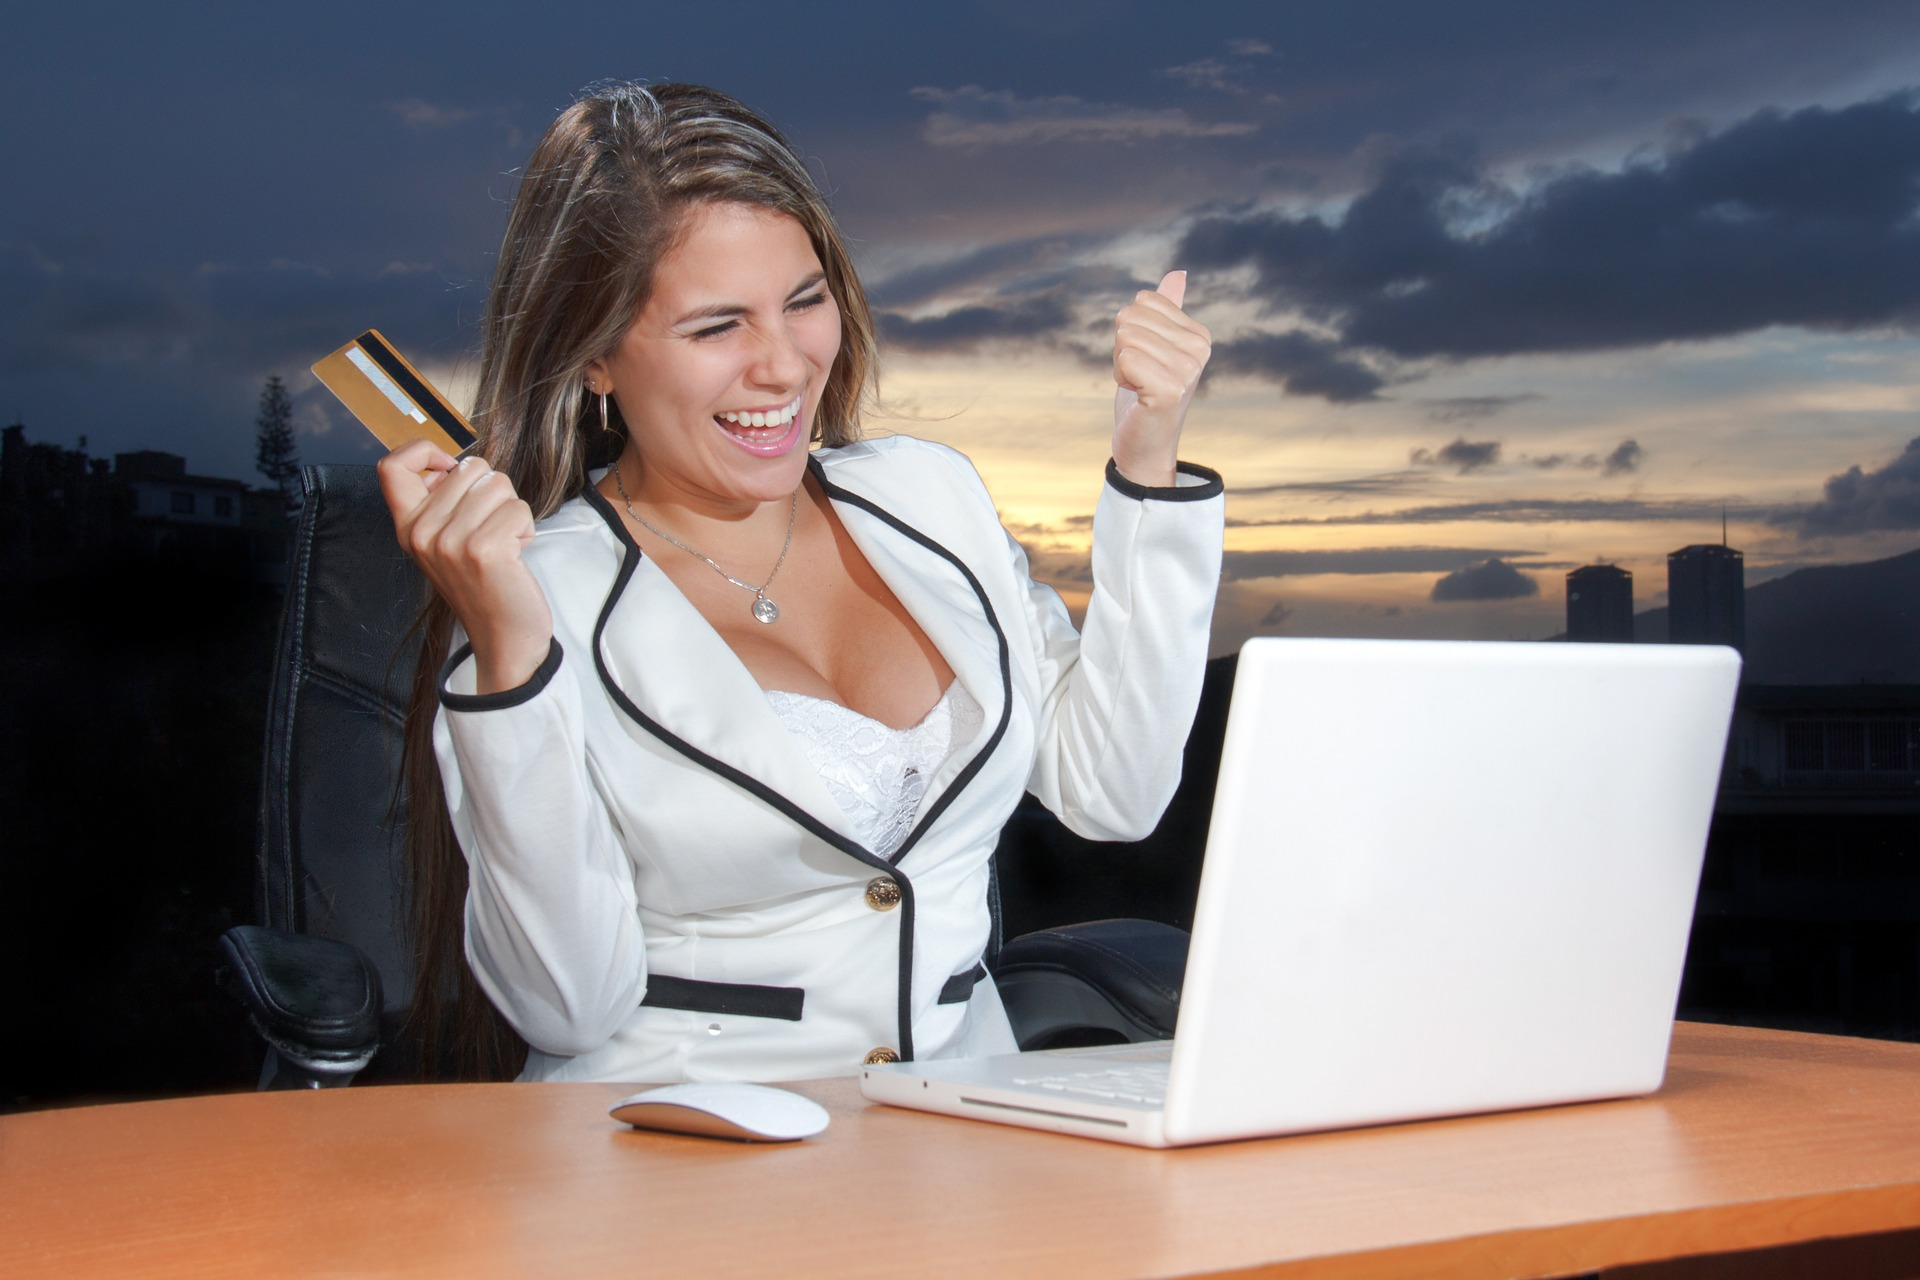 Кредит онлайн - это просто